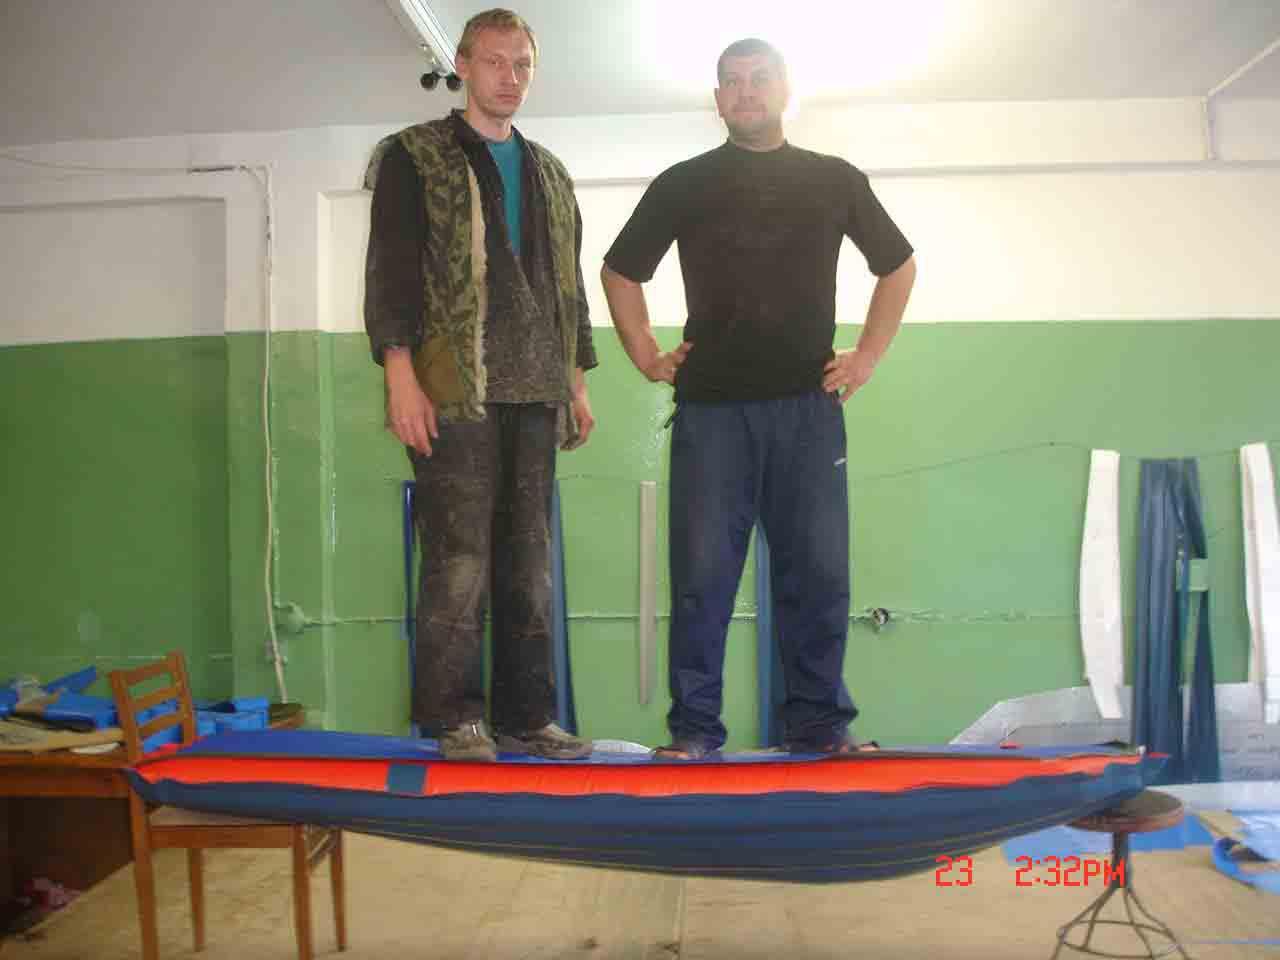 Надувное дно для лодки пвх своими руками 578